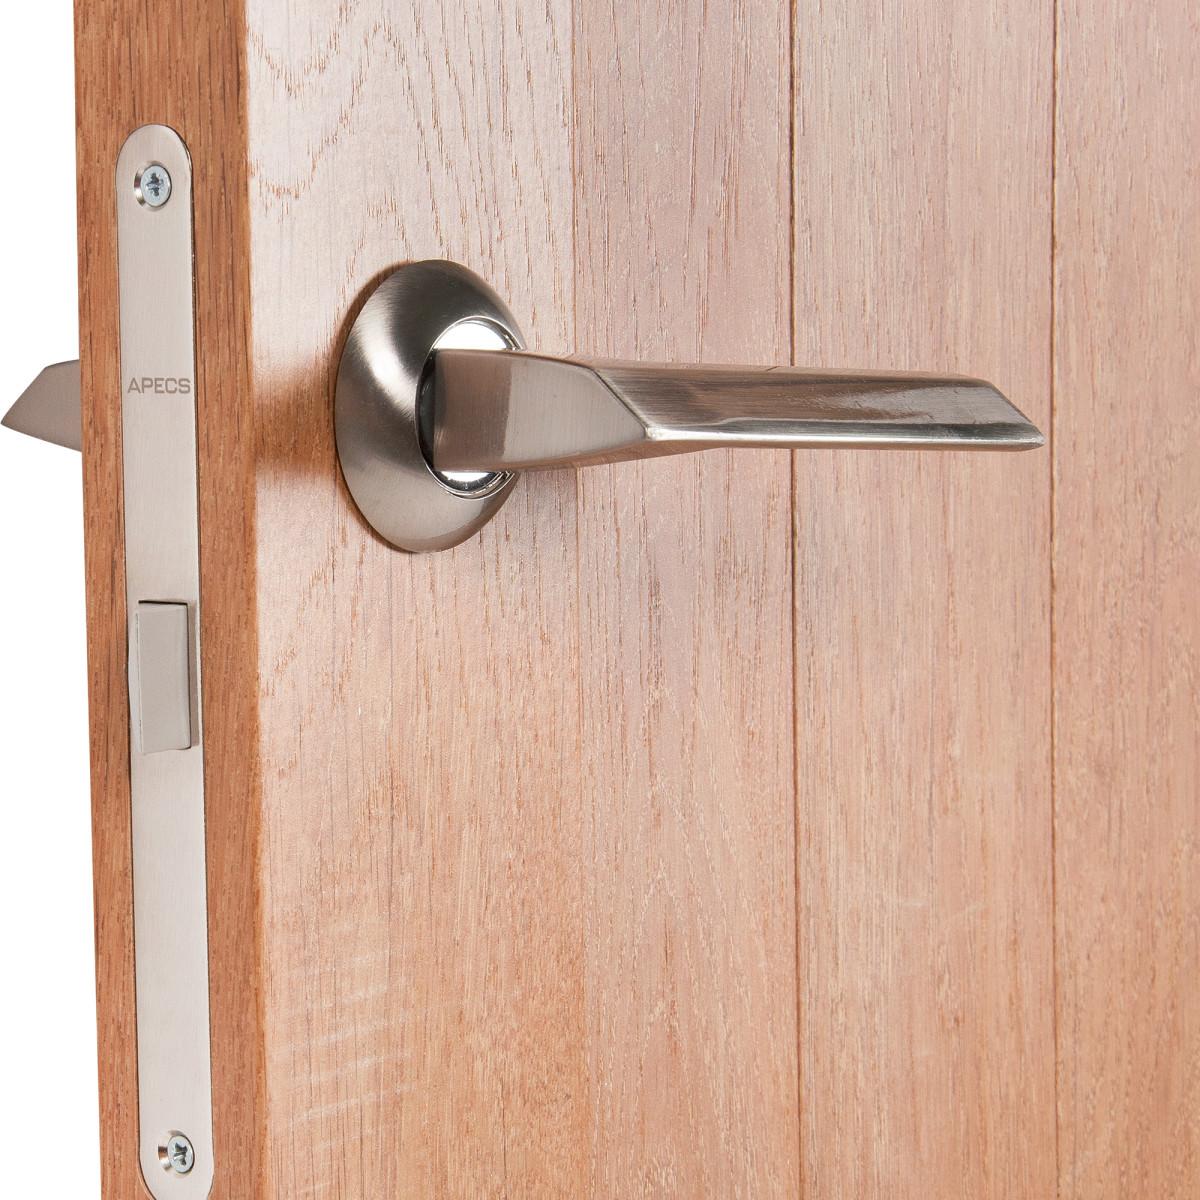 Дверь Межкомнатная Глухая Кантри 60x200 Пвх Цвет Дуб Арагон С Фурнитурой